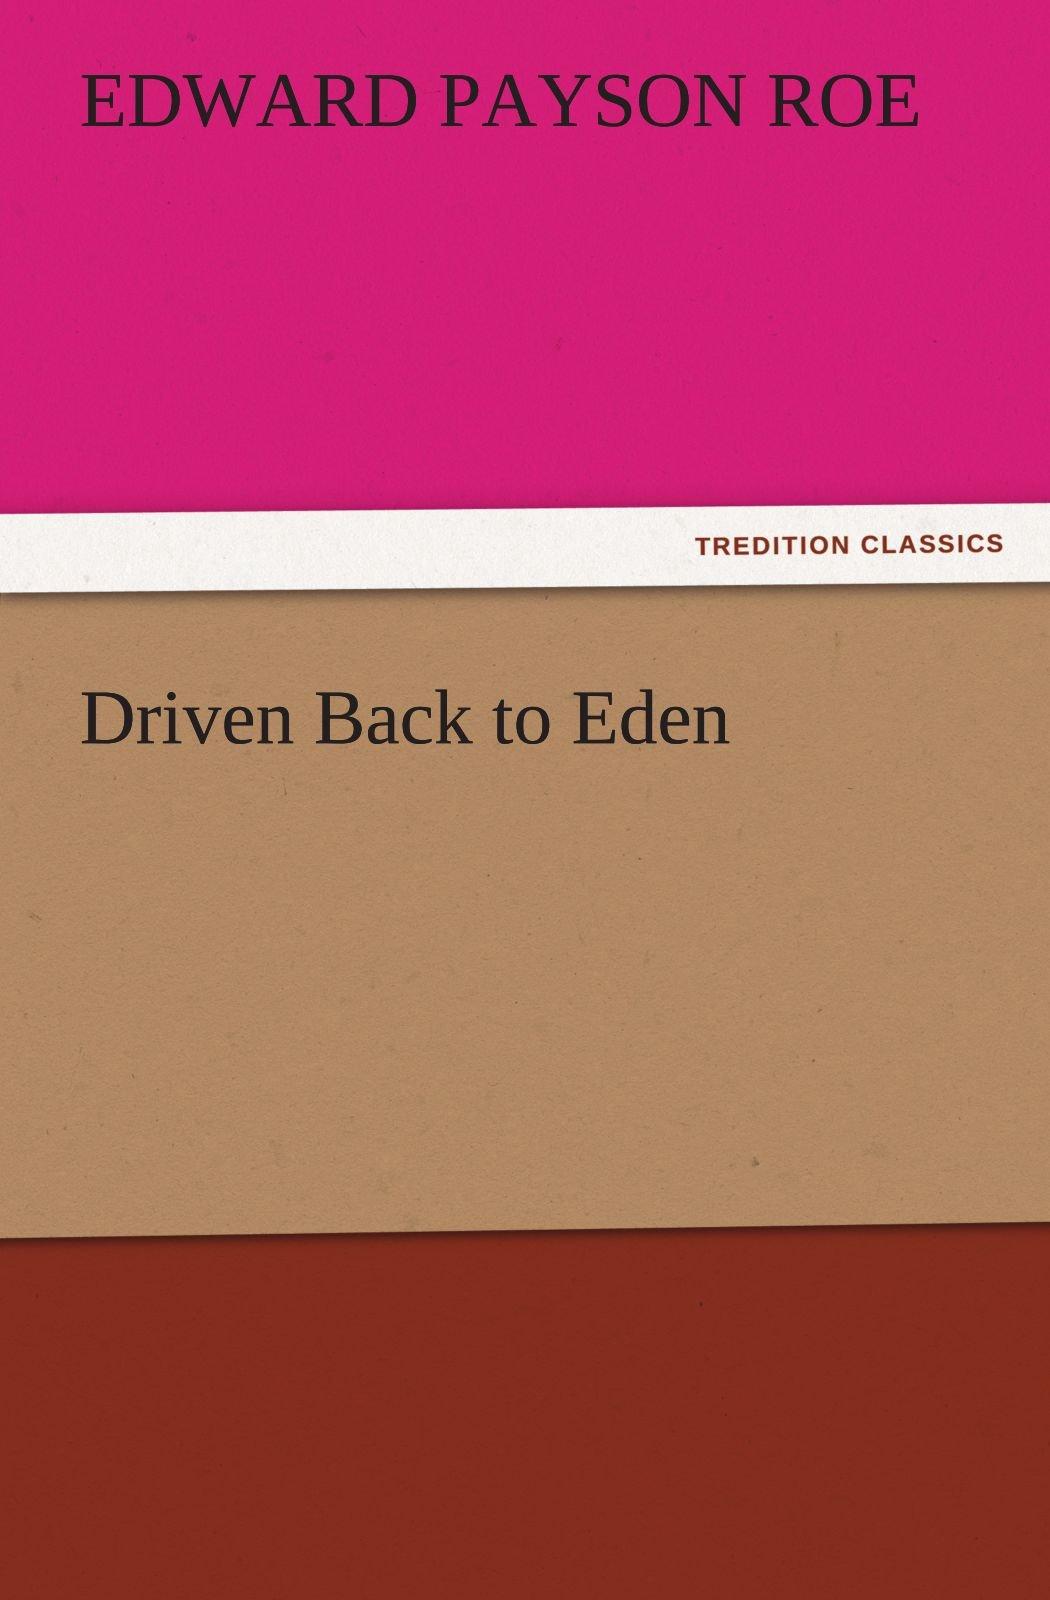 Read Online Driven Back to Eden (TREDITION CLASSICS) PDF ePub book